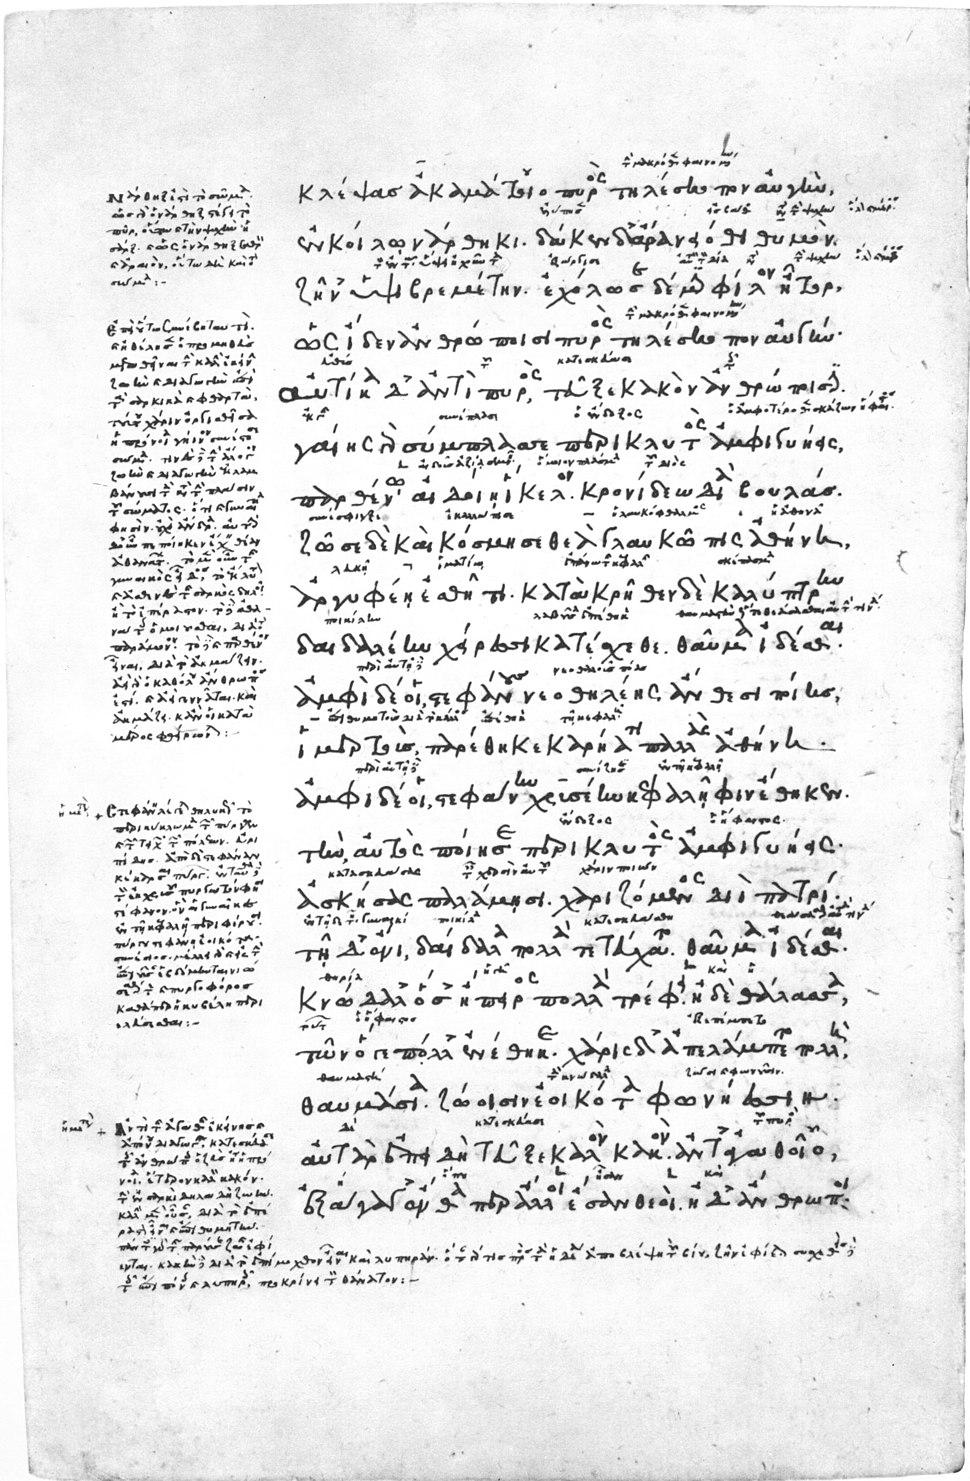 Hesiod, Theogony, Venice, Gr. 464